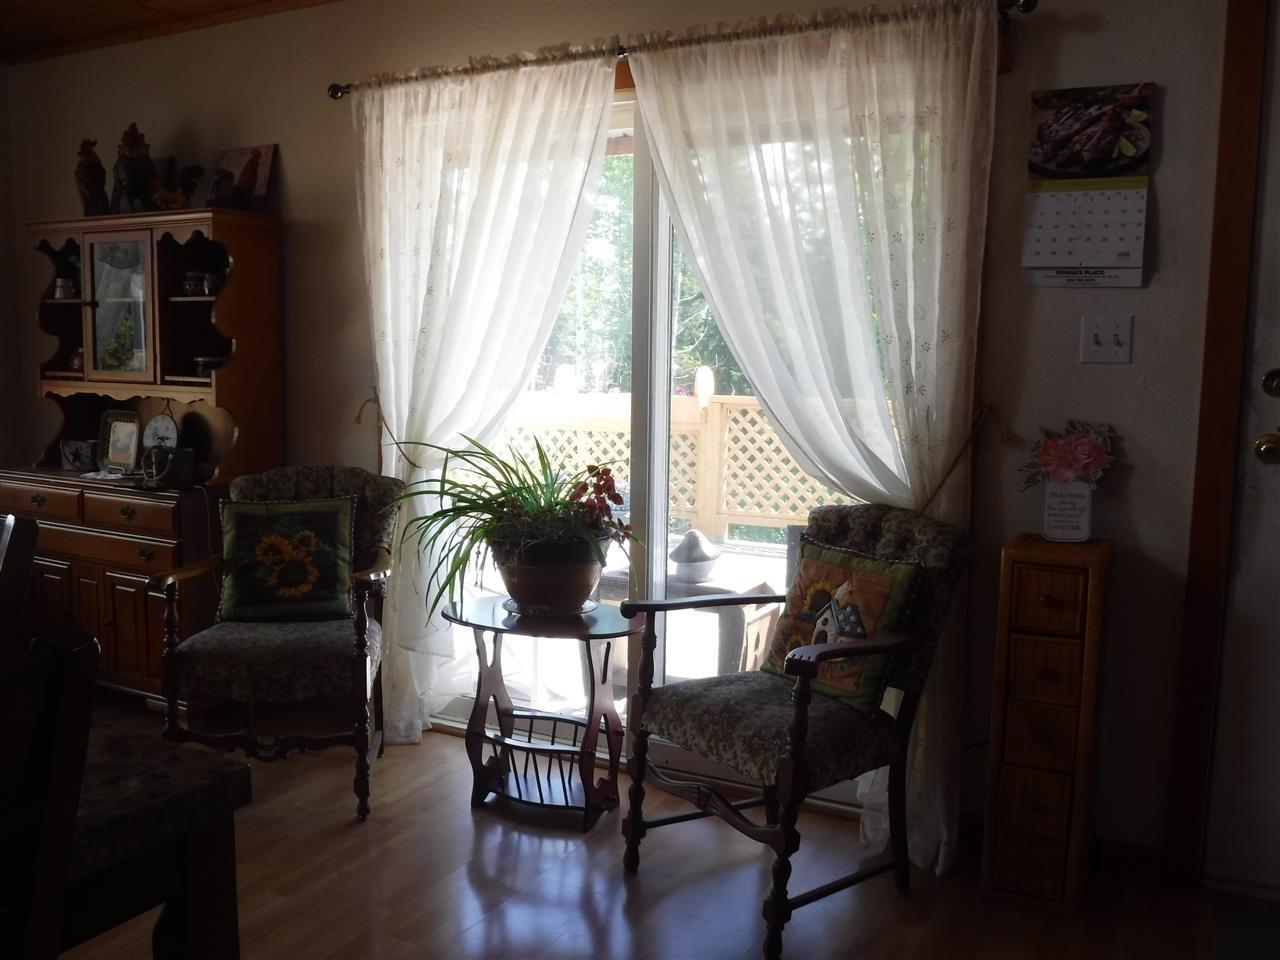 Photo 24: Photos: 3126 ELSEY Road in Williams Lake: Williams Lake - Rural West House for sale (Williams Lake (Zone 27))  : MLS®# R2467730